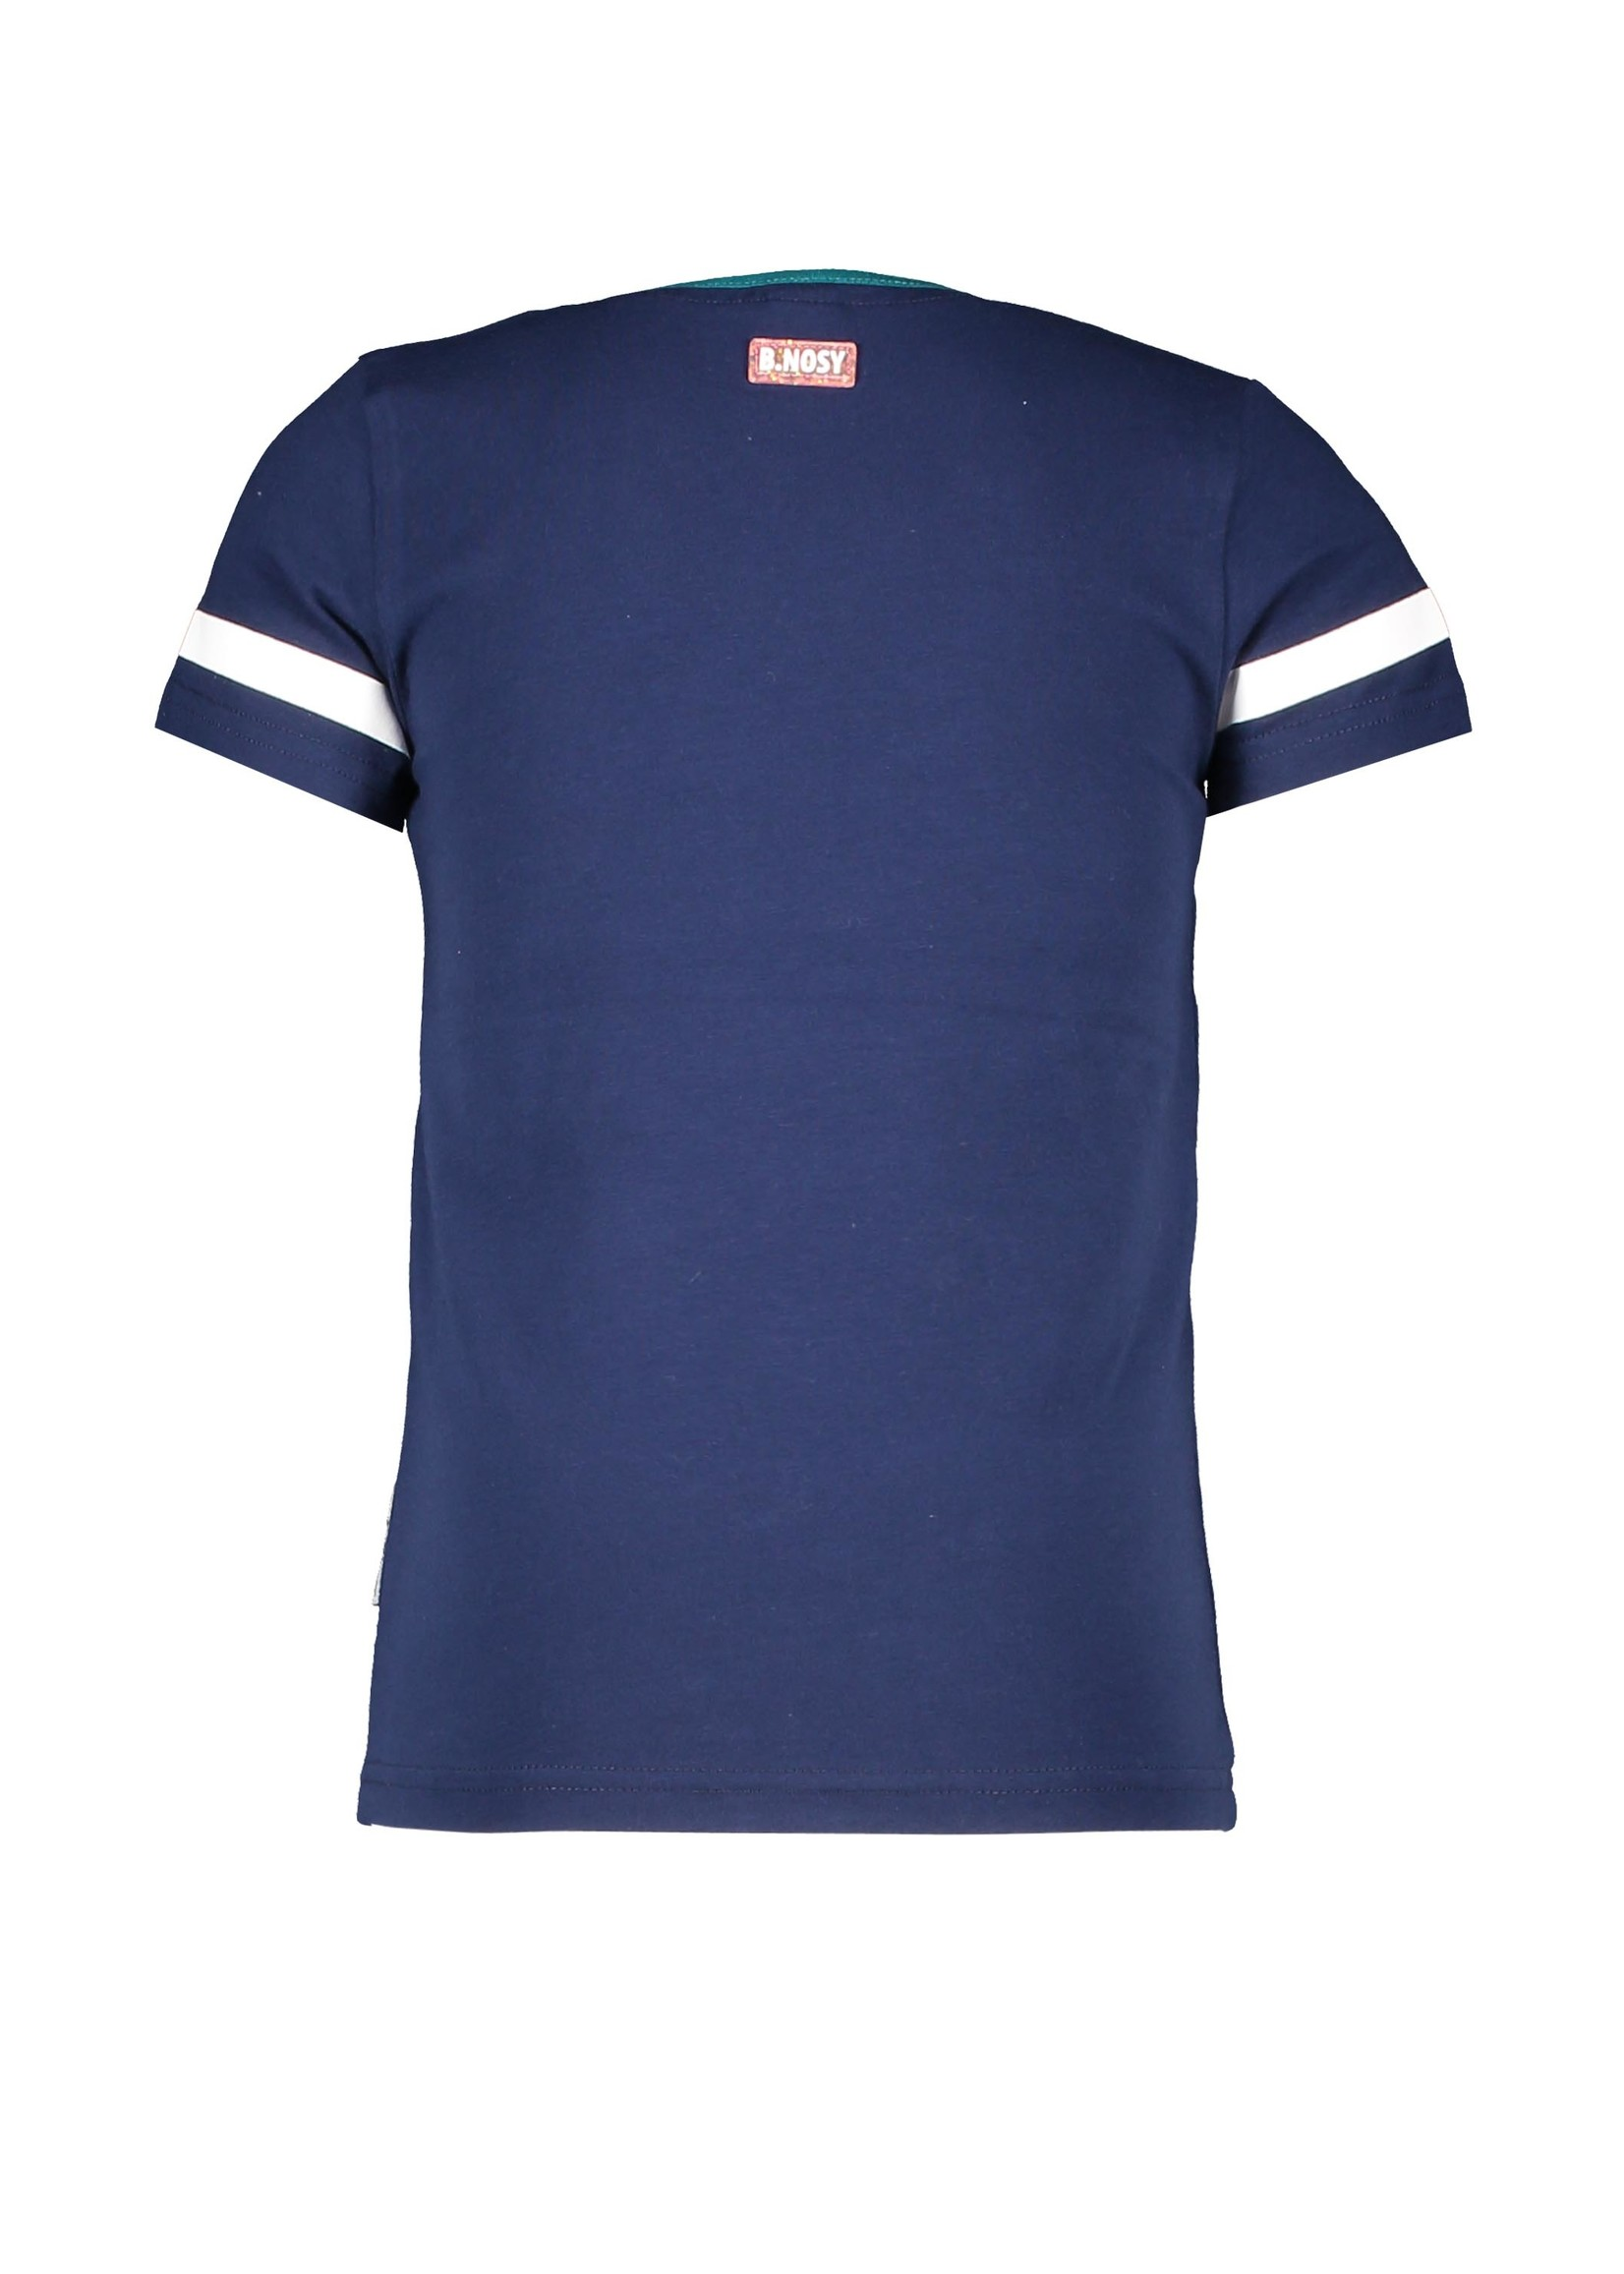 B.nosy Shirt Space Blue